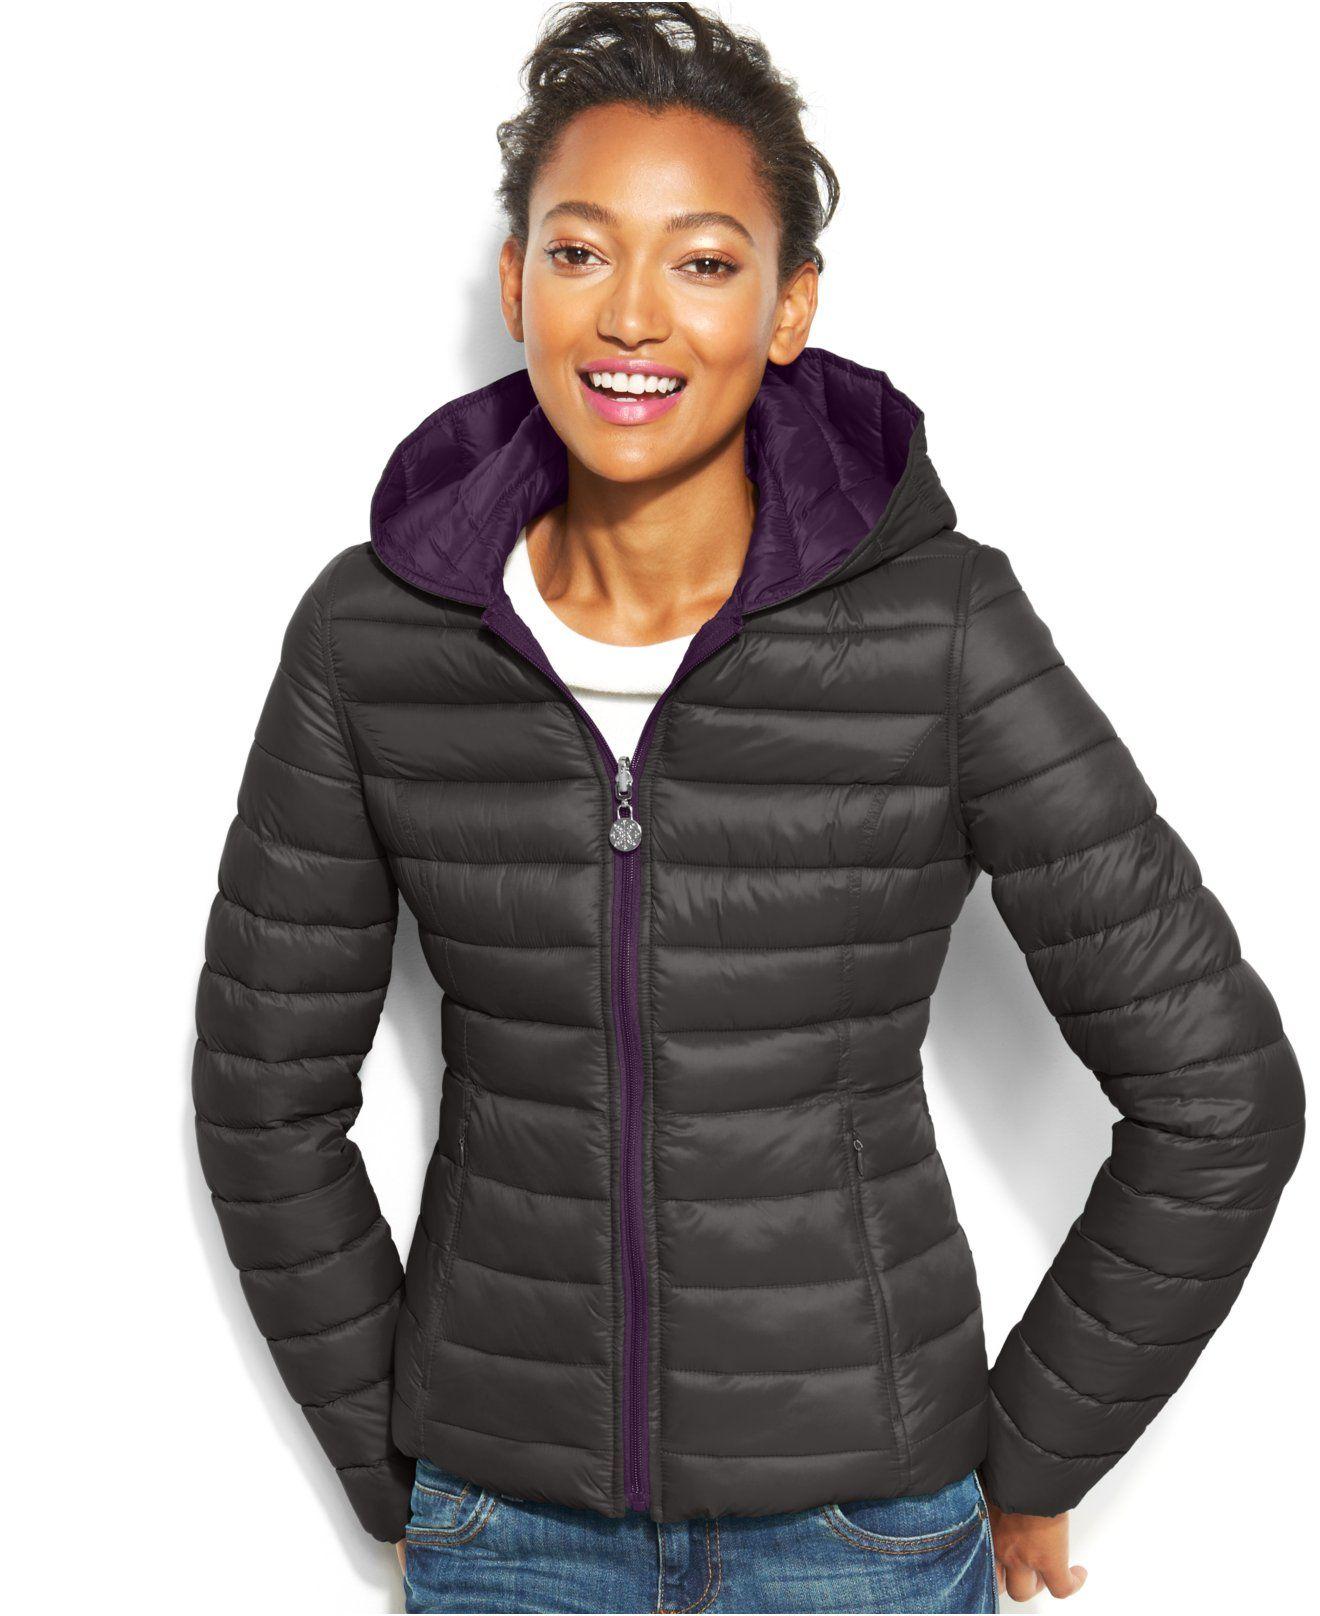 Nautica Reversible Hooded Quilted Packable Puffer Coat Coats Women Macy S Puffer Coat Women S Puffer Coats Coats For Women [ 1616 x 1320 Pixel ]